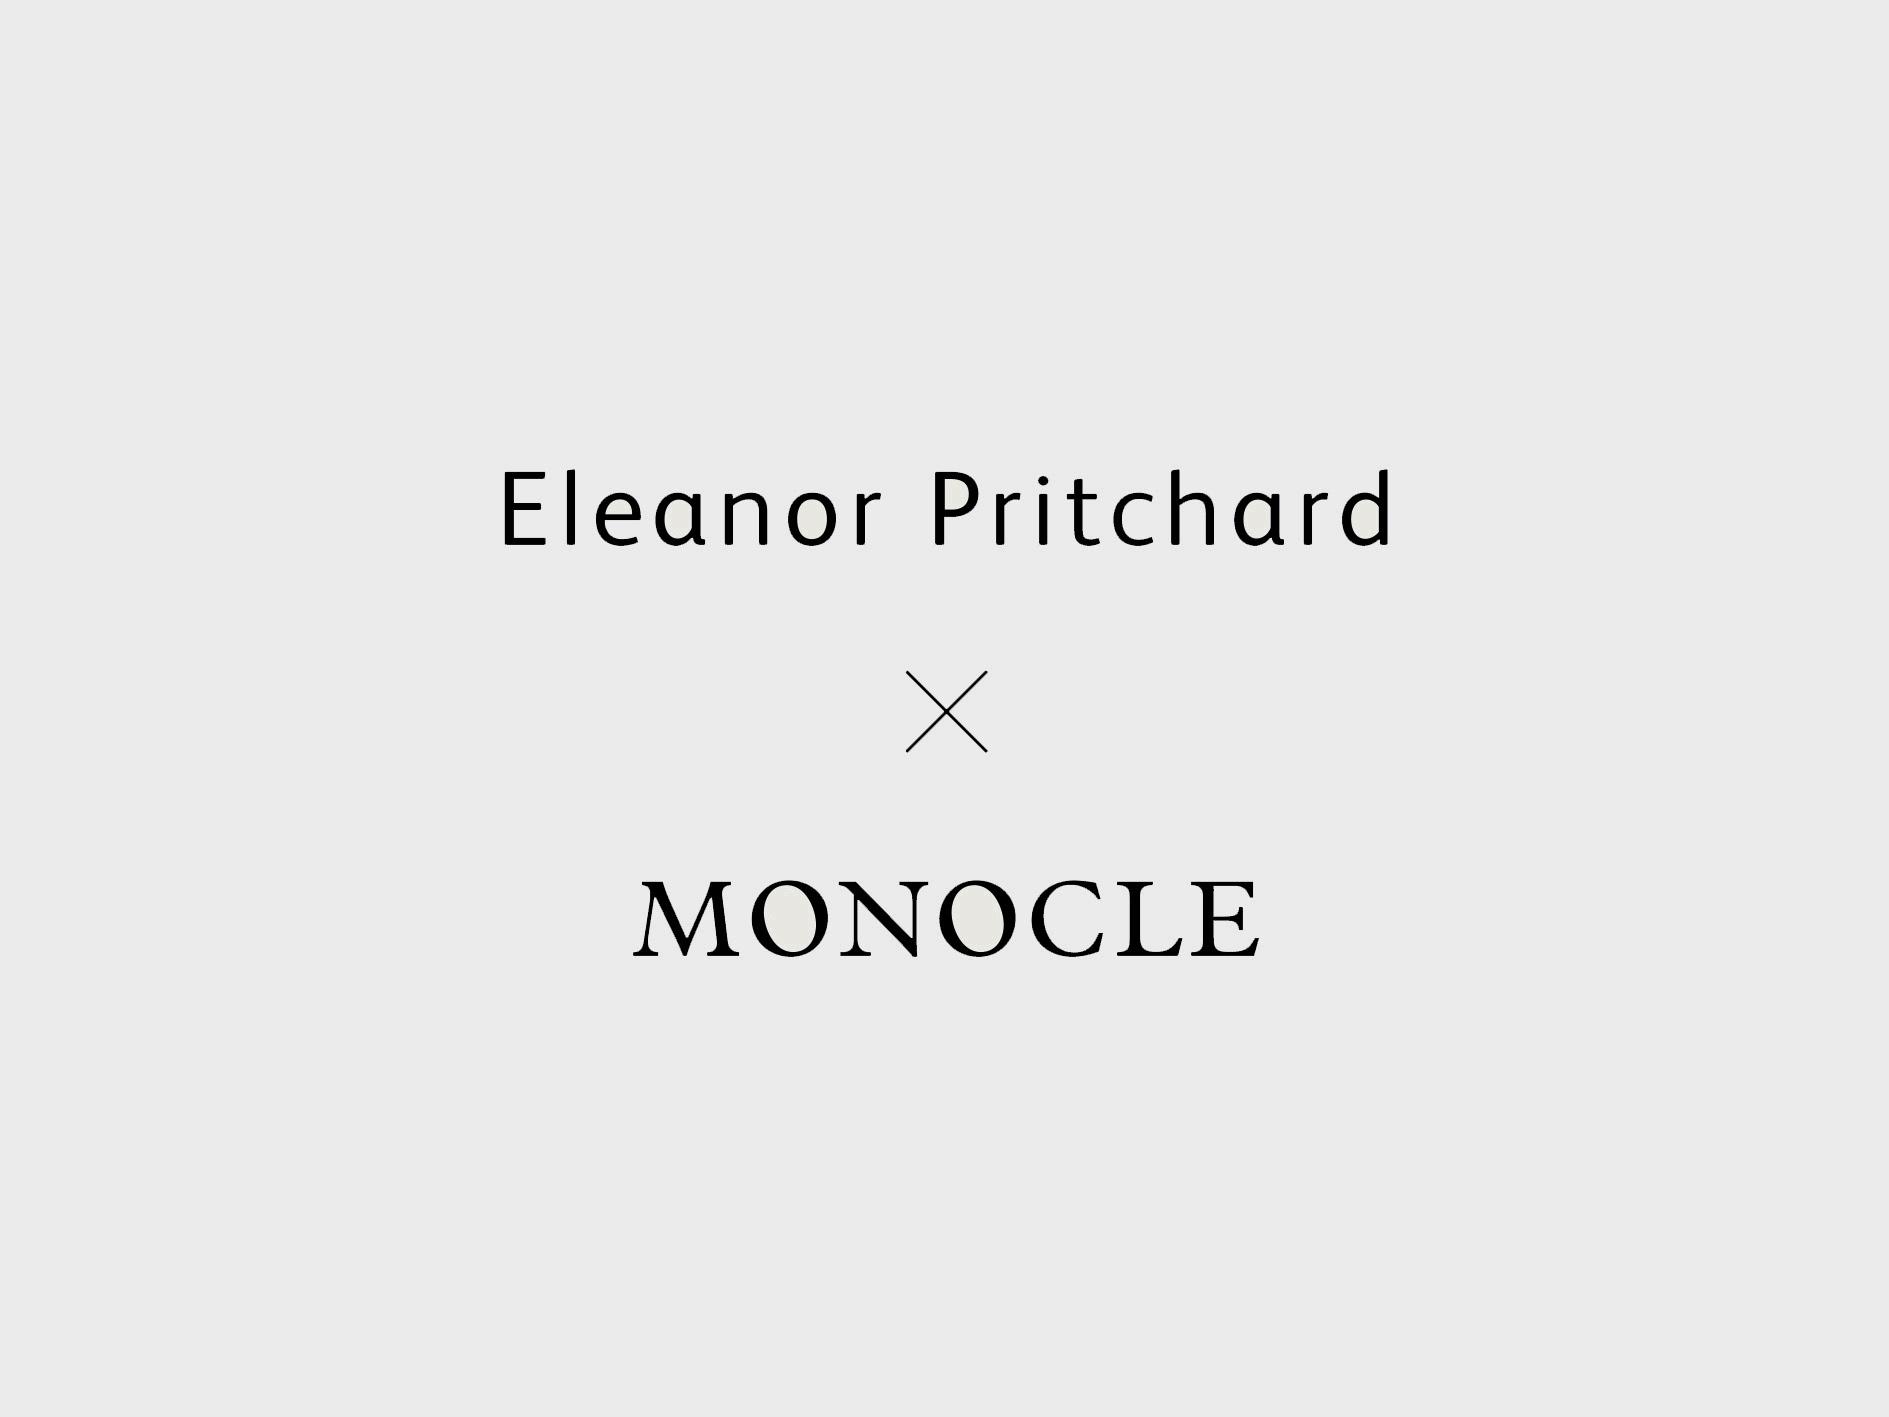 Eleanor Pritchard x Monocle - text block 2.jpg